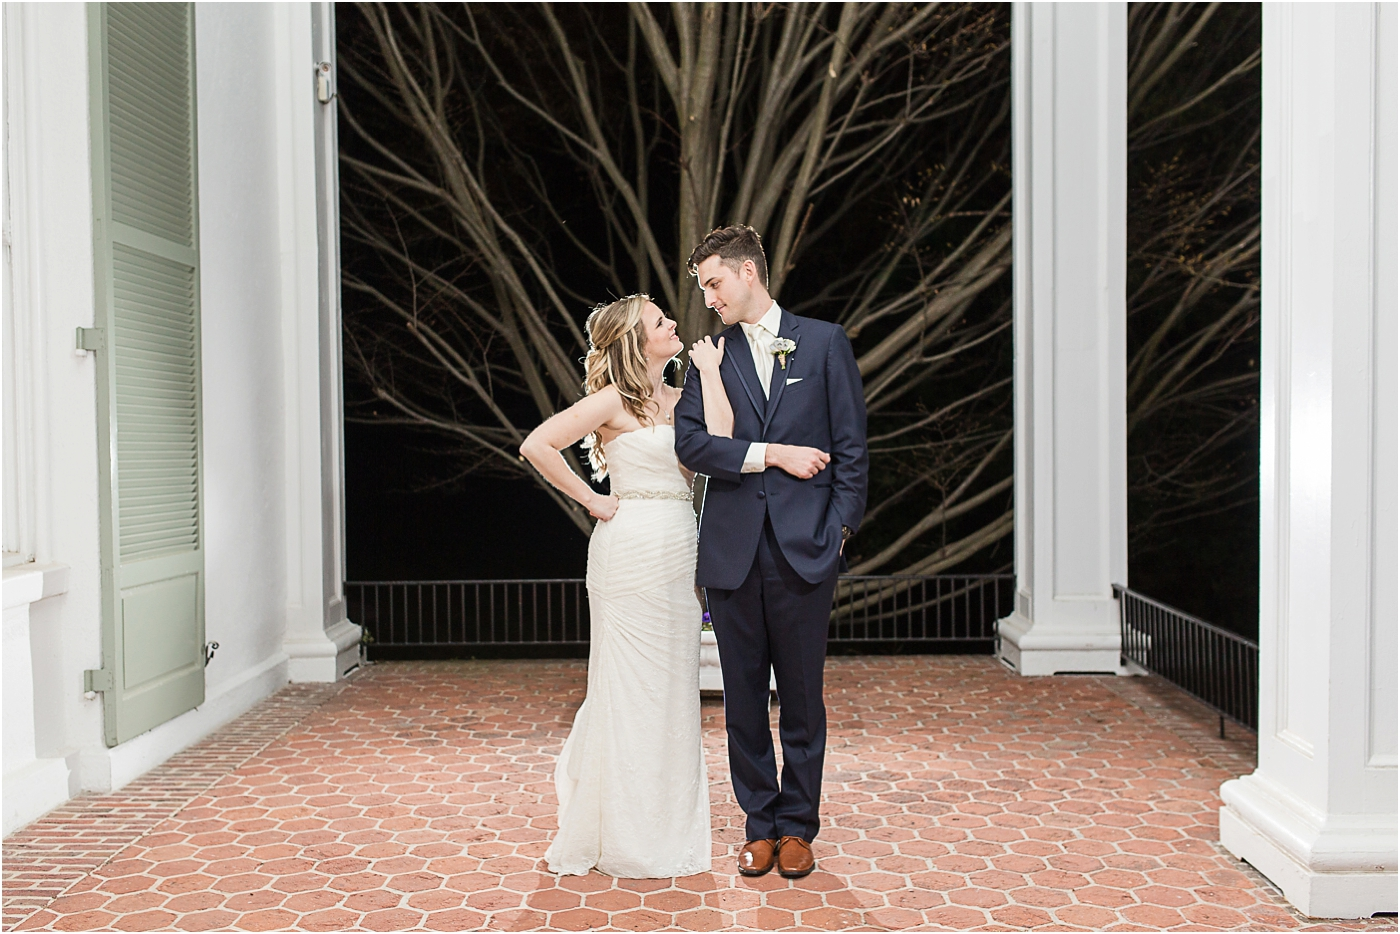 Greyrock-mansion-wedding-97.jpg